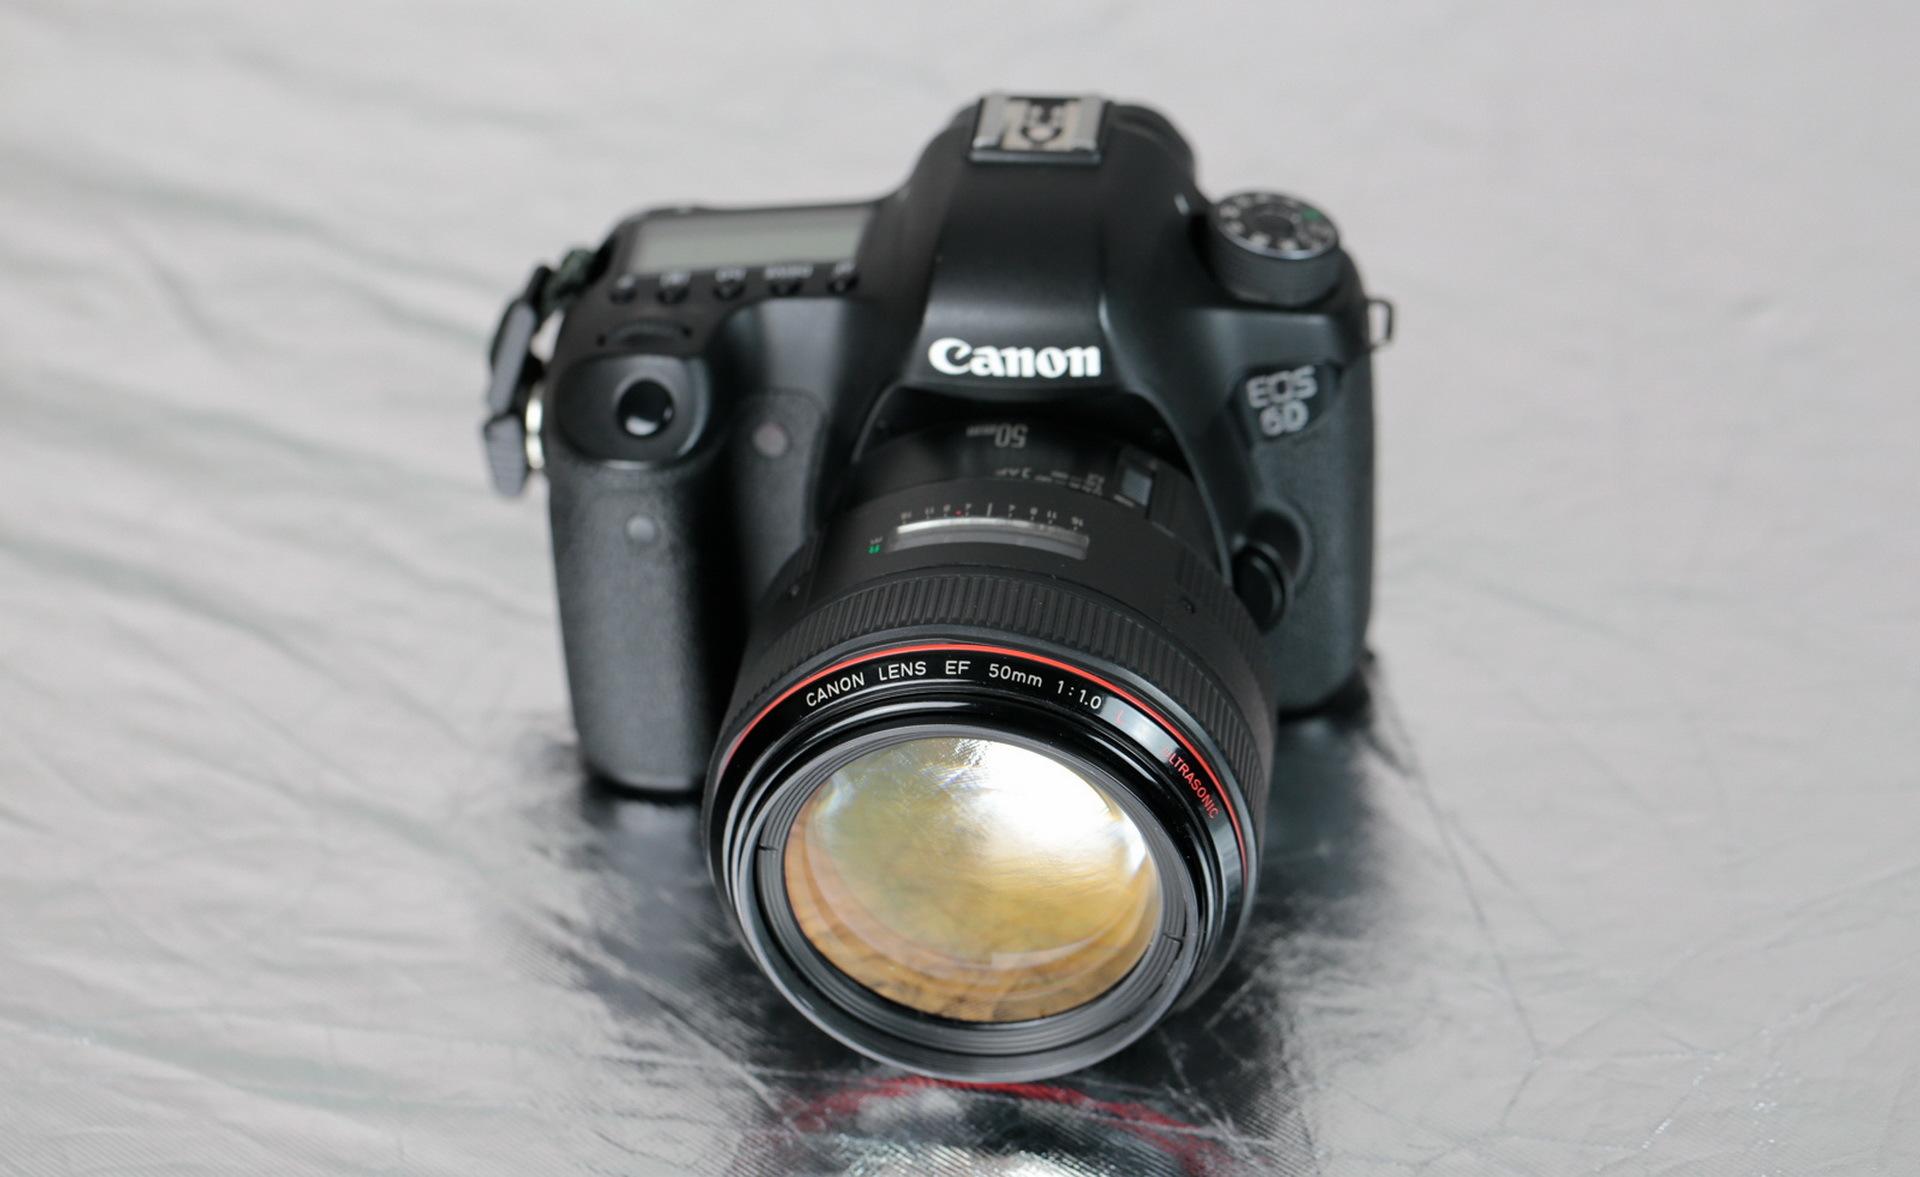 Canon lenses for concert photography Burj al arab Photo Free Download - Freepik